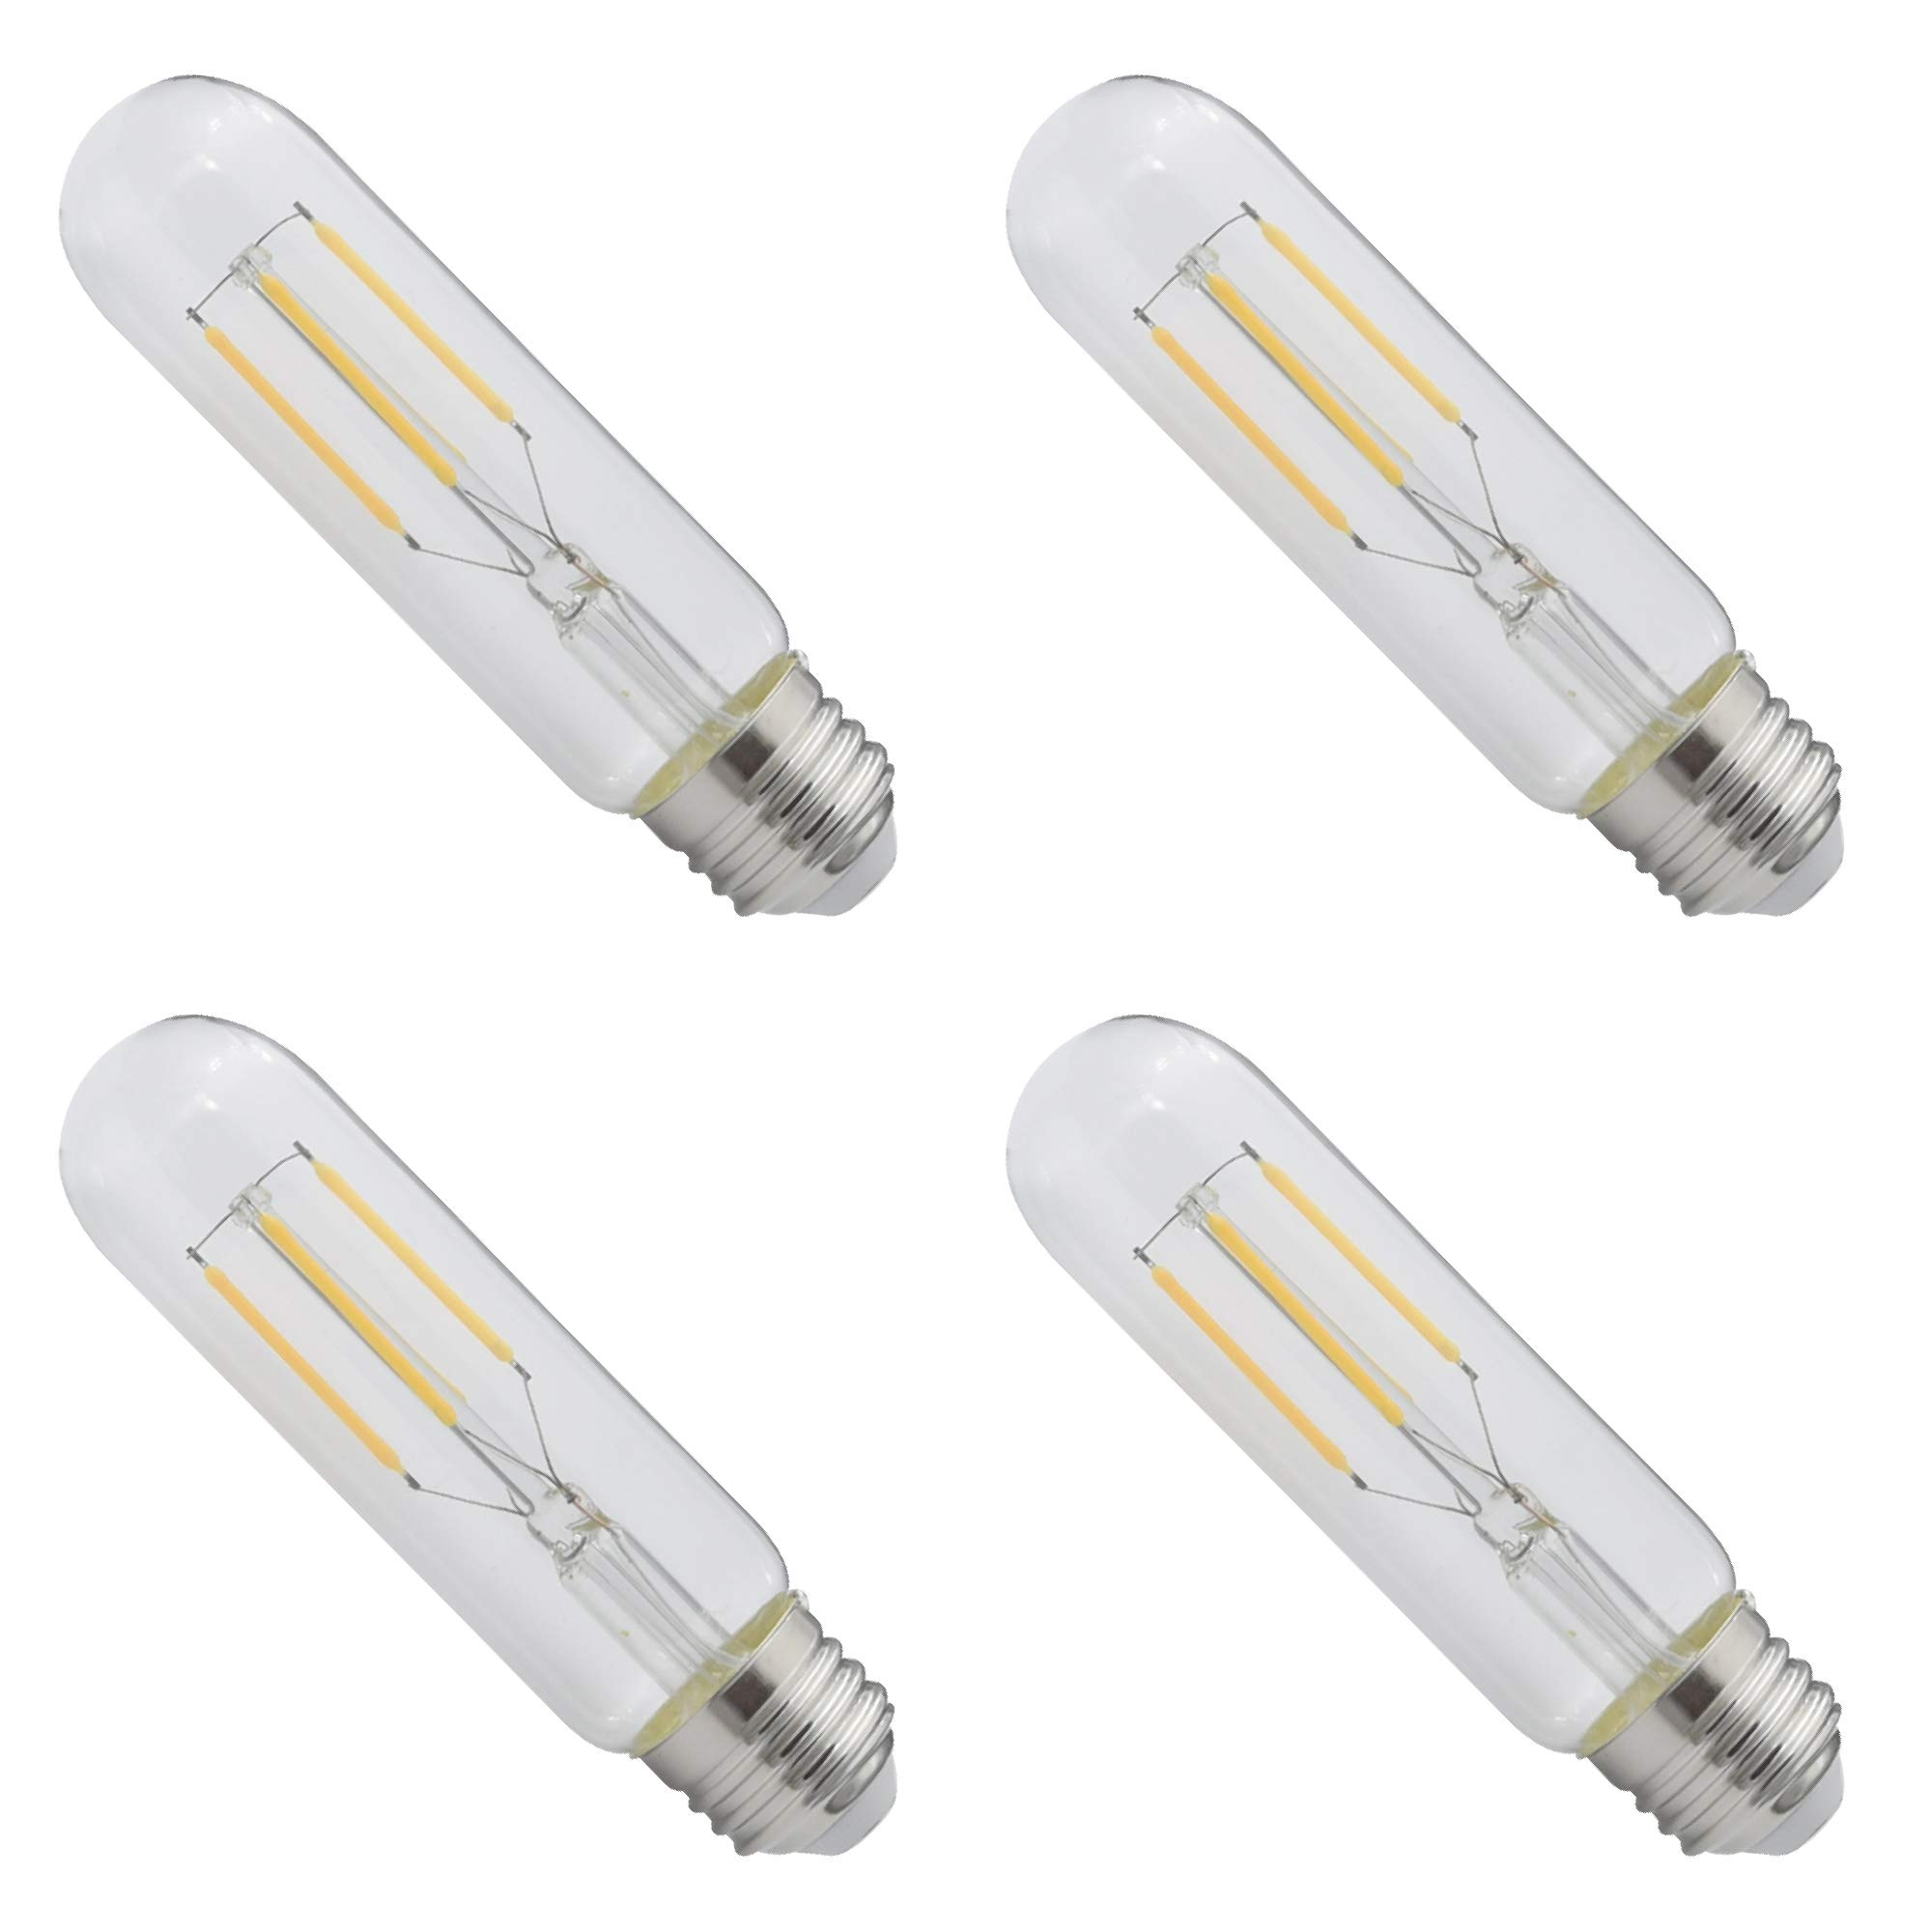 Candex LED Filament T10 Bulb E26 Medium Base, 4W (40W Equivalent), 2700K Warm White, Dimmable, CEC Title 24 JA8 Compliant (4 Pack)